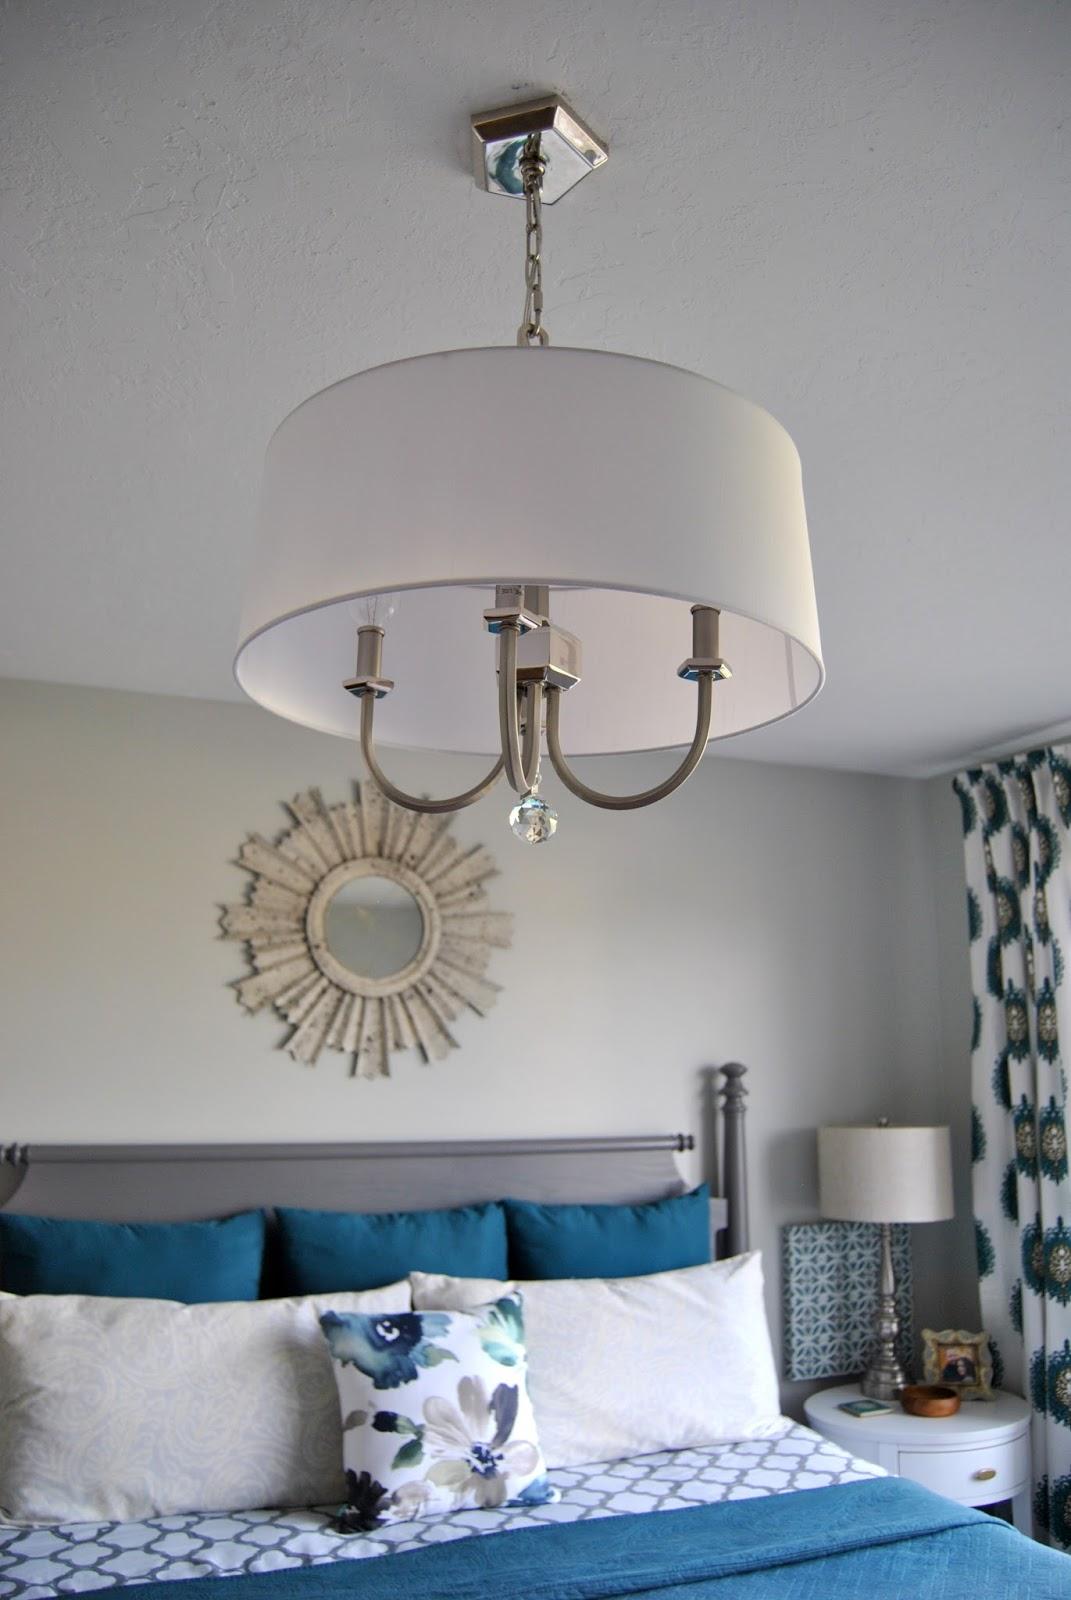 lighting lighting design chandelier drum shade chandelier white drum shade crystal & Studio 7 Interior Design: Instagram 10k Giveaway: The Lighting ... azcodes.com